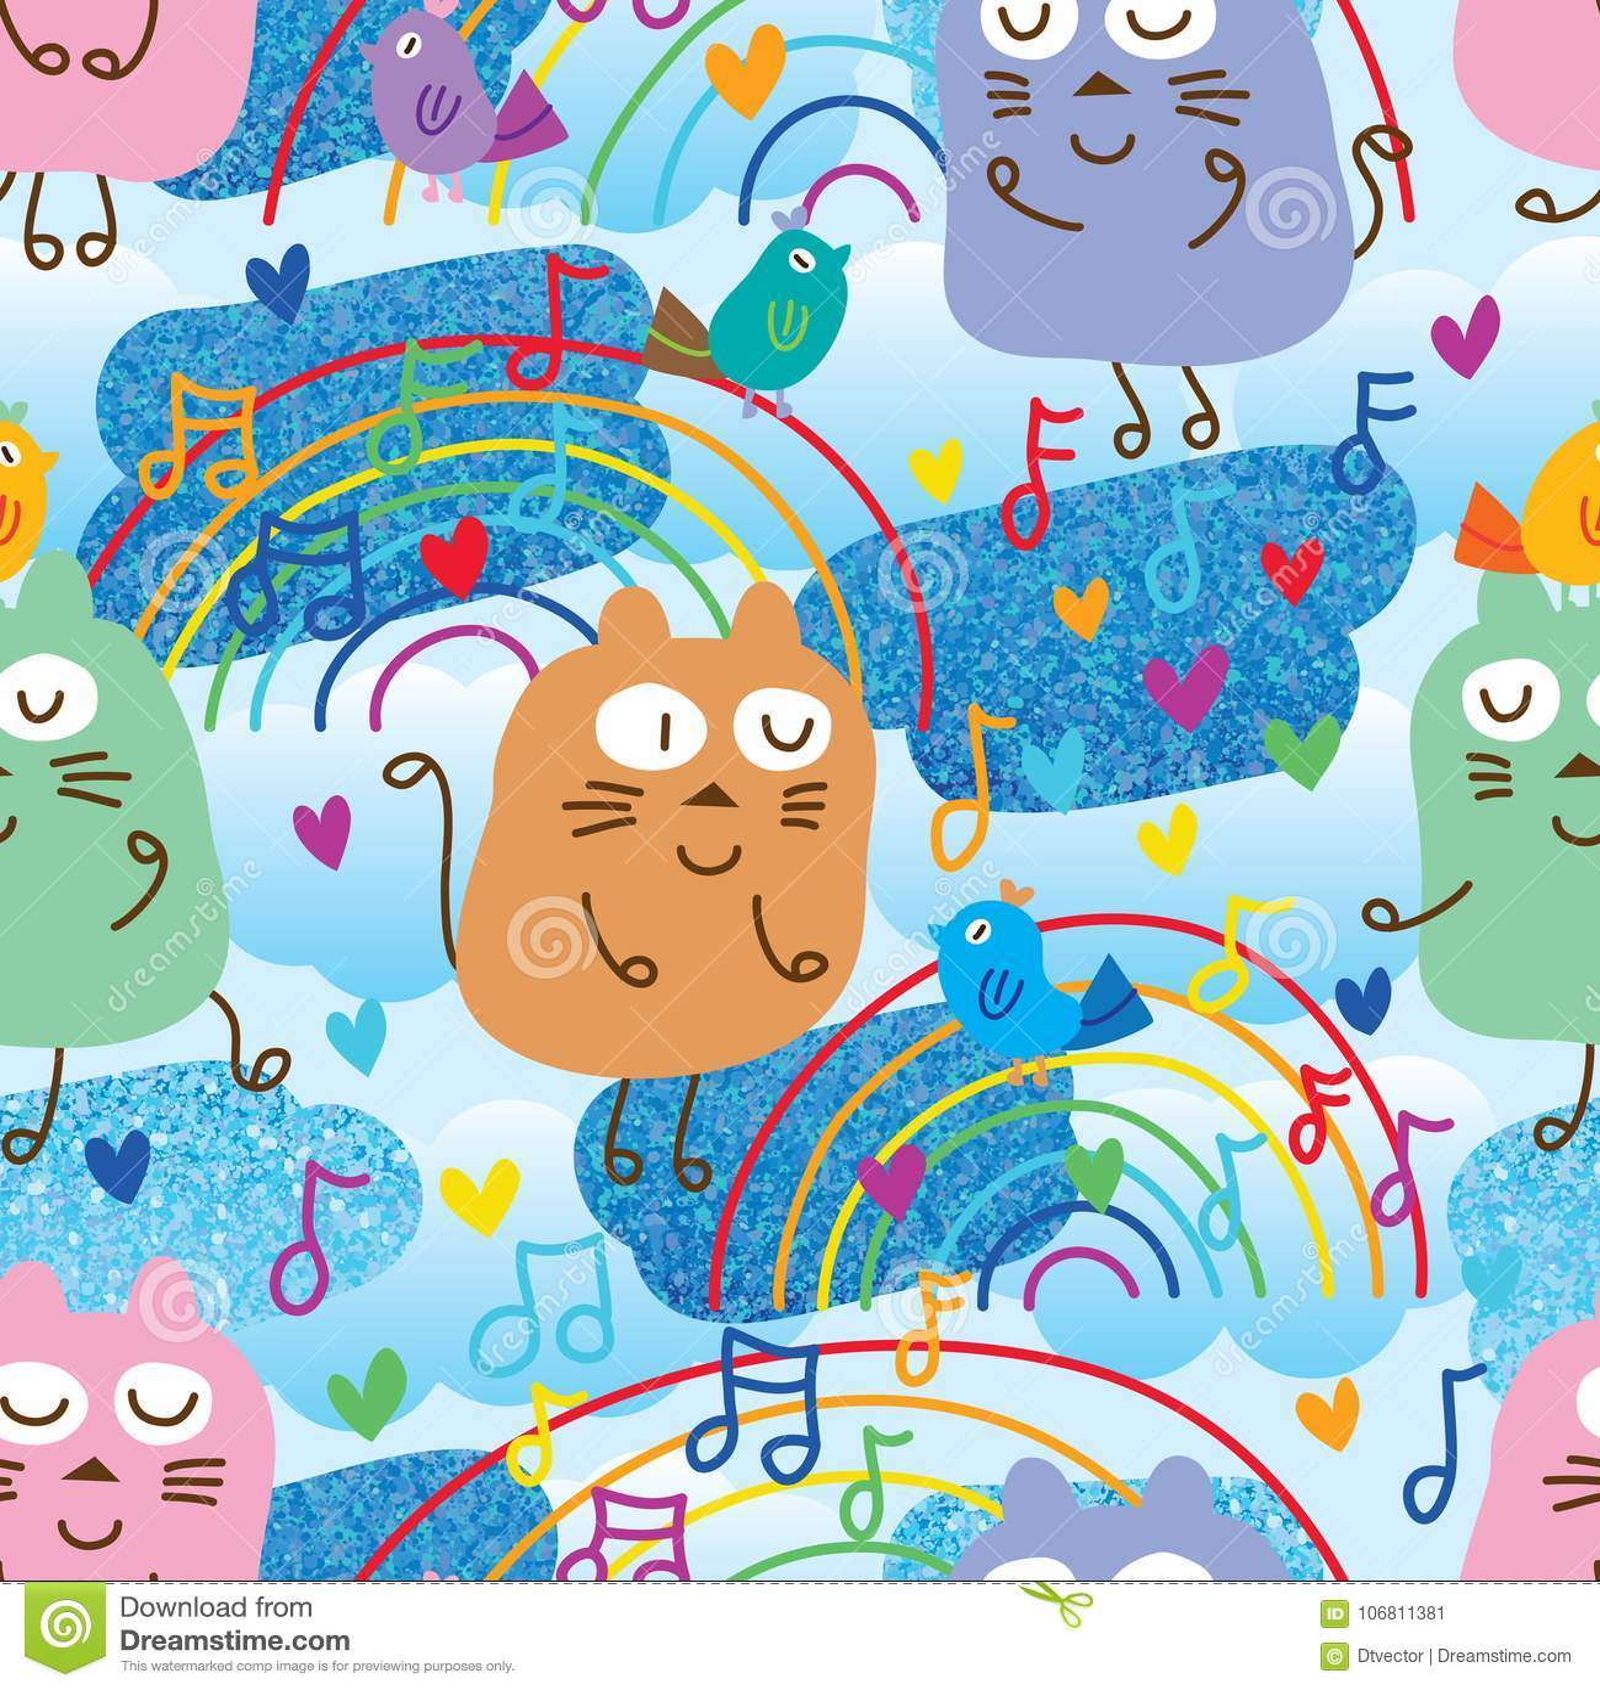 Cat and bird music note blue glitter seamless pattern